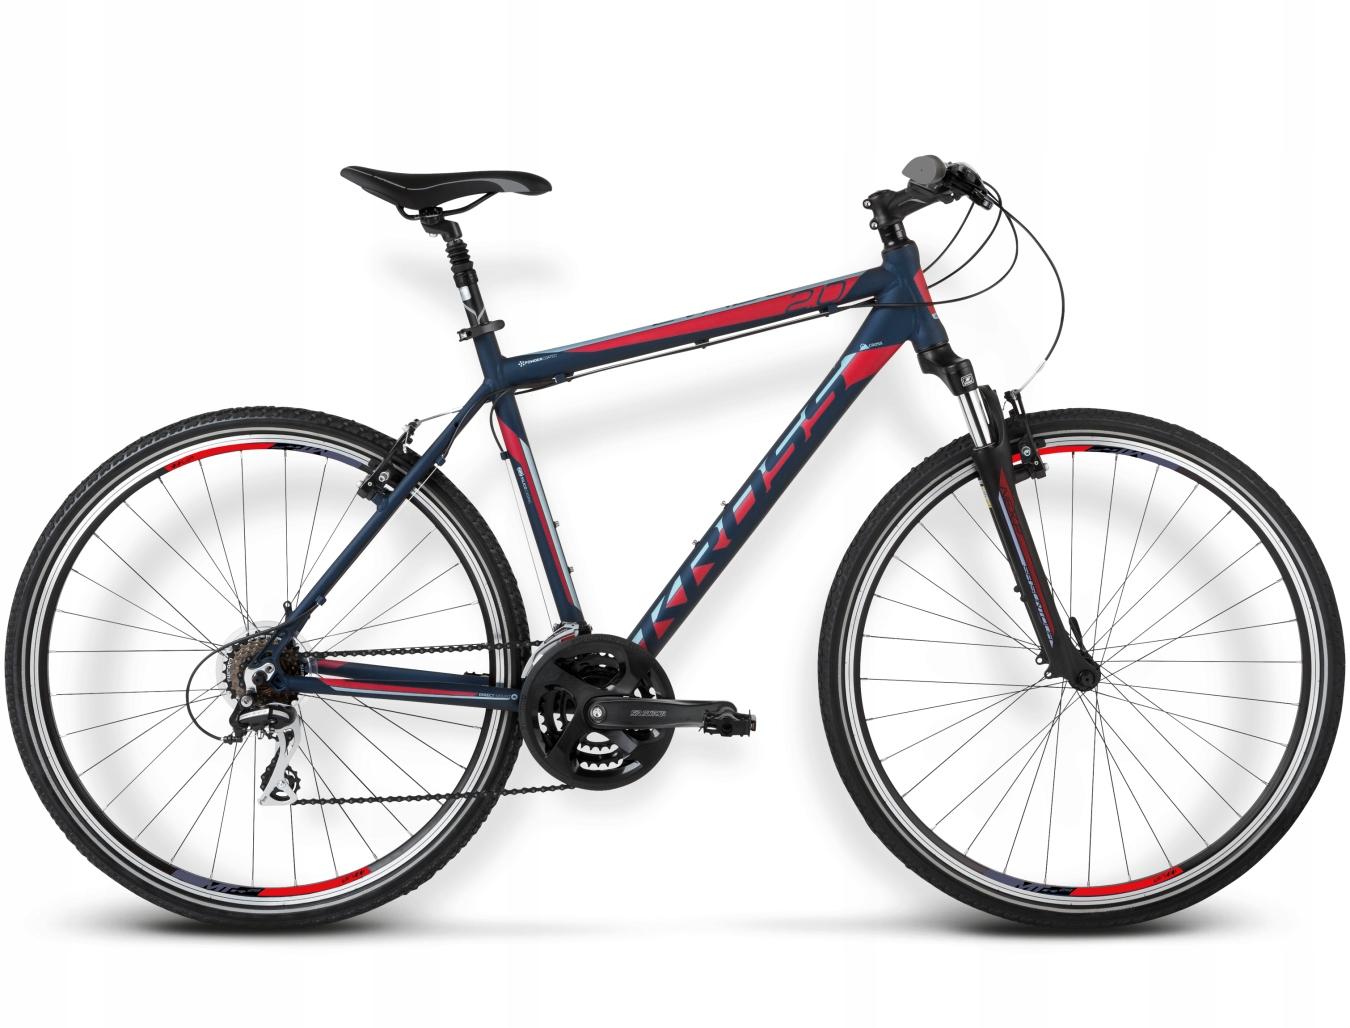 Rower Turystyczny Kross Evado 2.0 + Gratisy !!